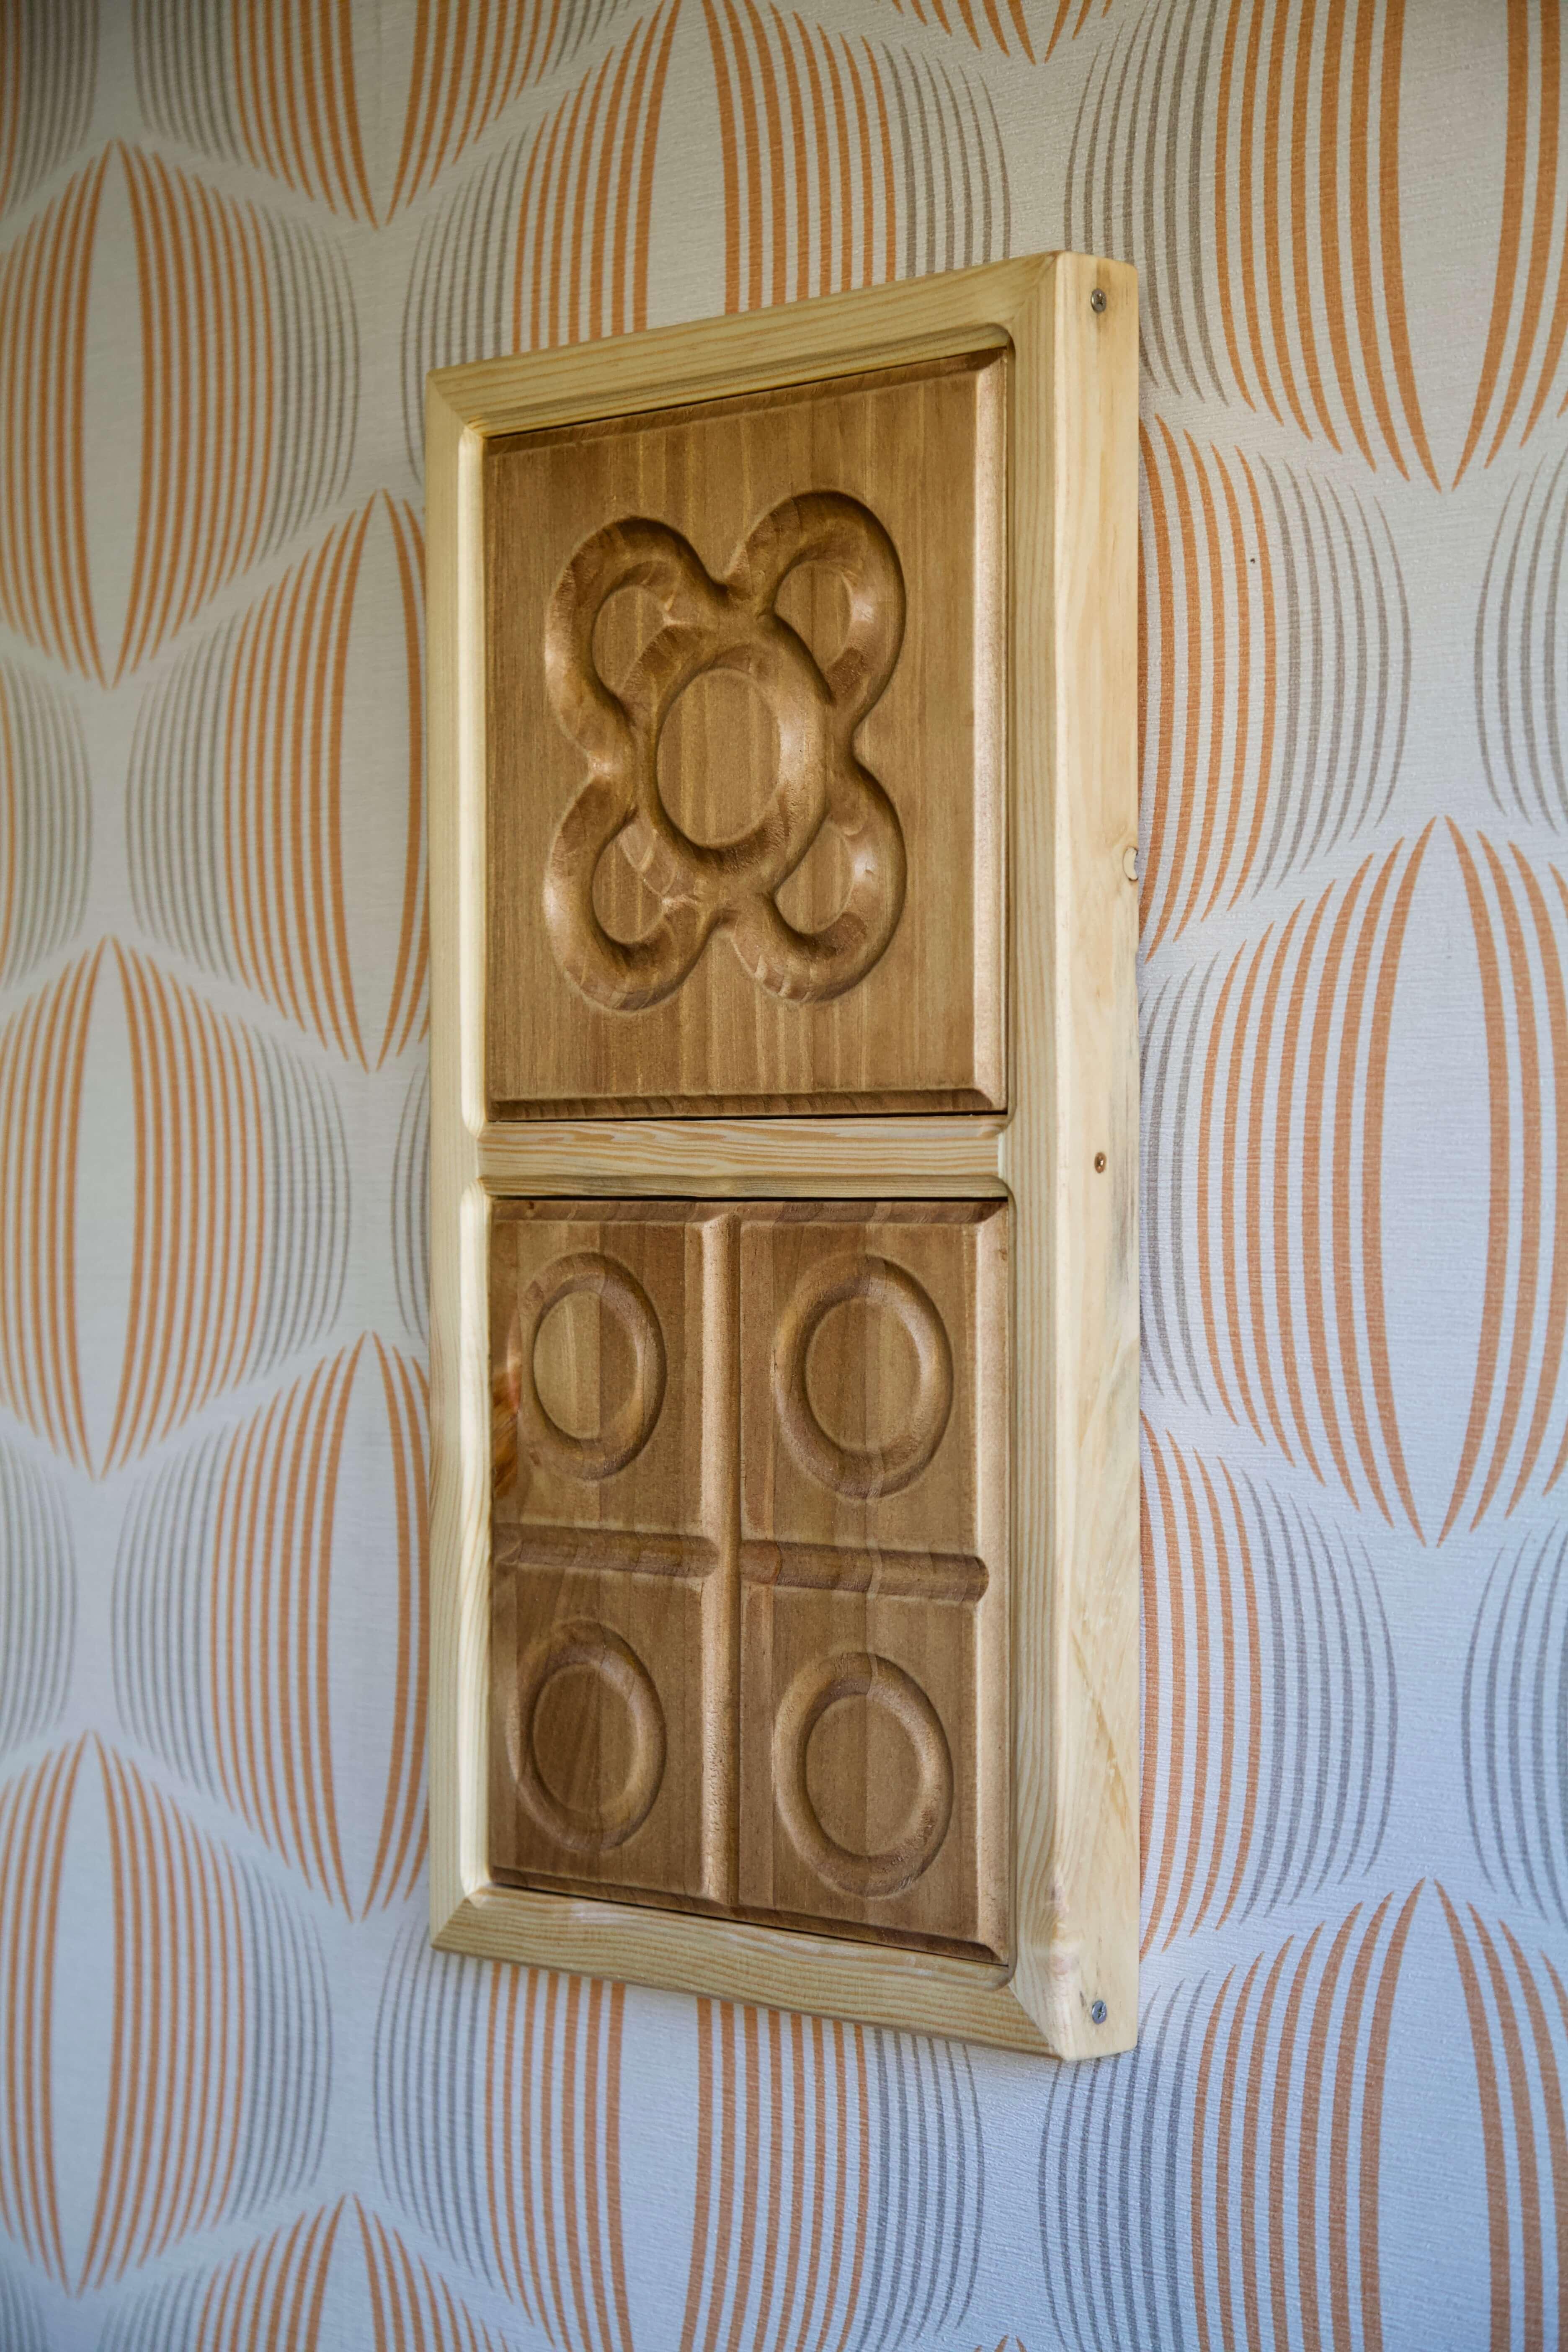 imagen lateral derecha del marco con panot flor de barcelona